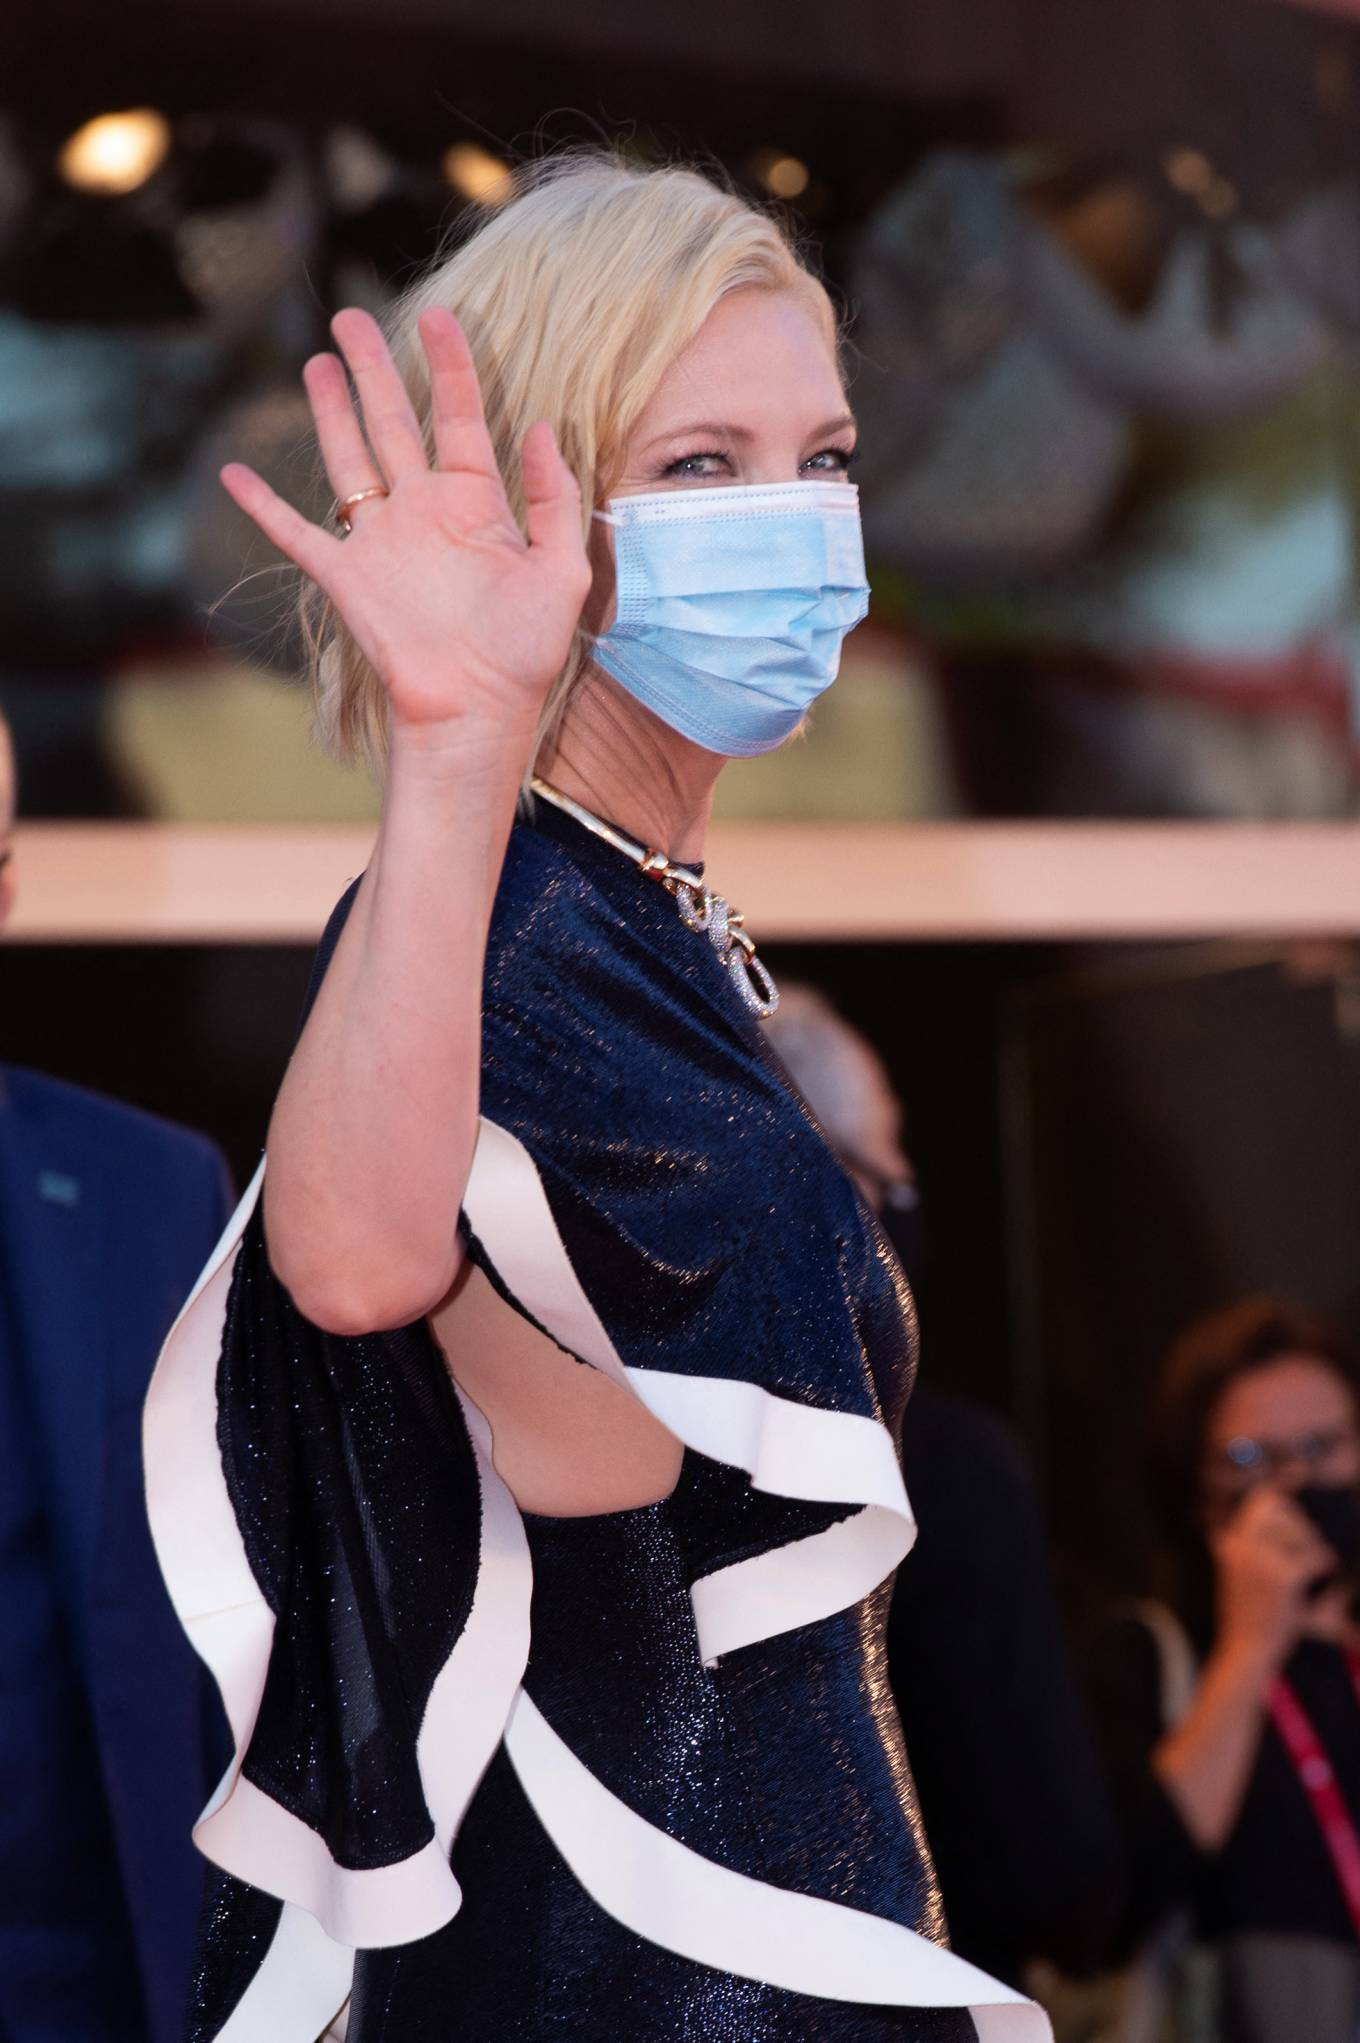 Cate Blanchett 2020 : Cate Blanchett attending Opening Ceremony at 2020 Venice International Film Festival – Italy-05